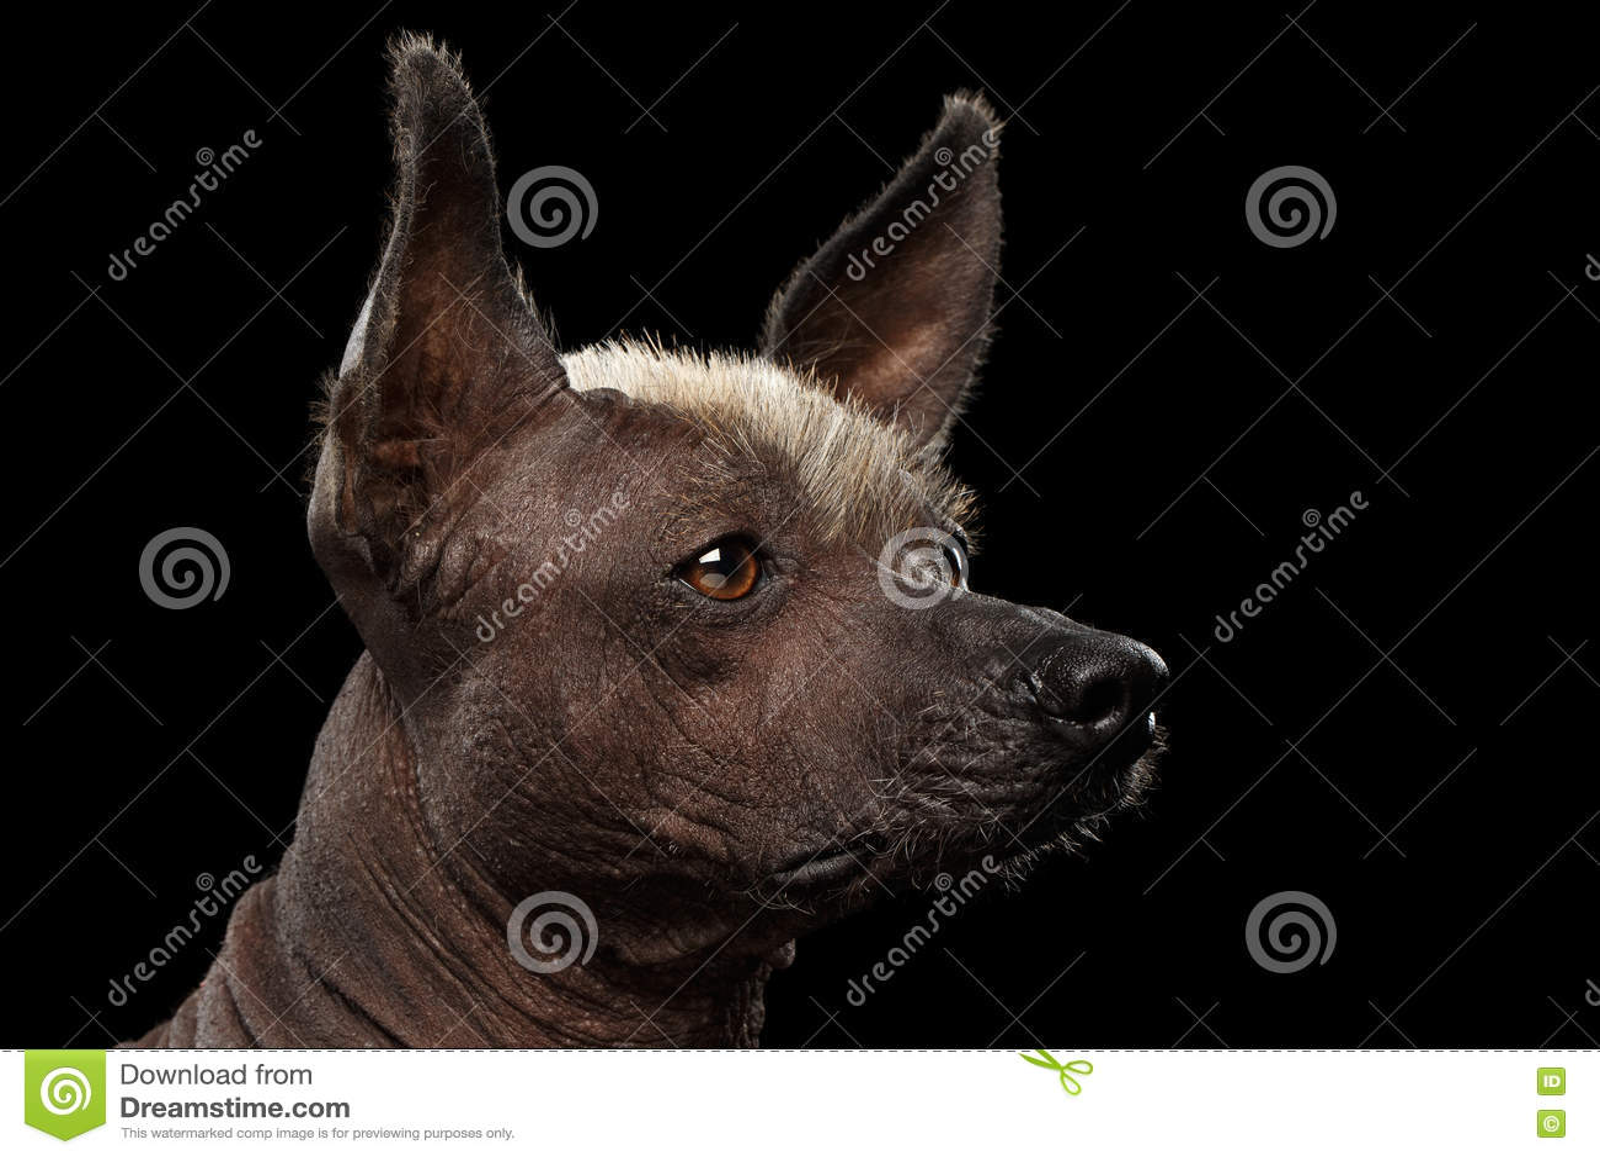 Xoloitzcuintle - άτριχη μεξικάνικη φυλή σκυλιών, πορτρέτο στούντιο στο μαύρο υπόβαθρο